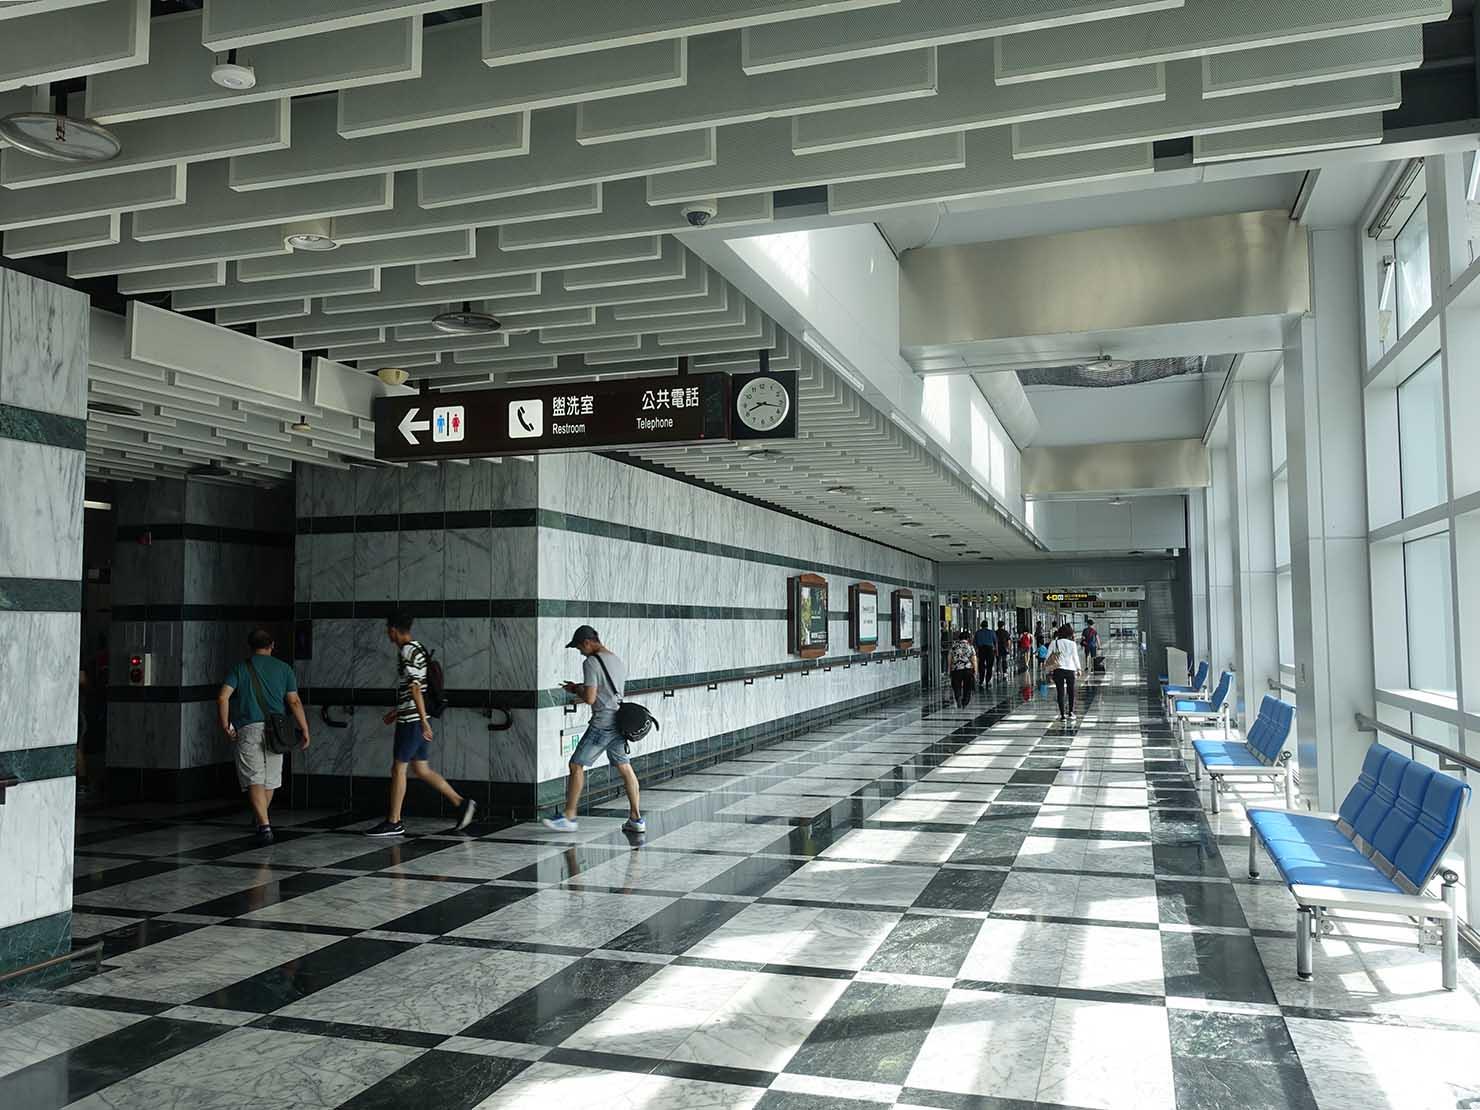 KKday外国人限定「花蓮・太魯閣(タロコ)日帰りツアー」花蓮空港の到着ロビー